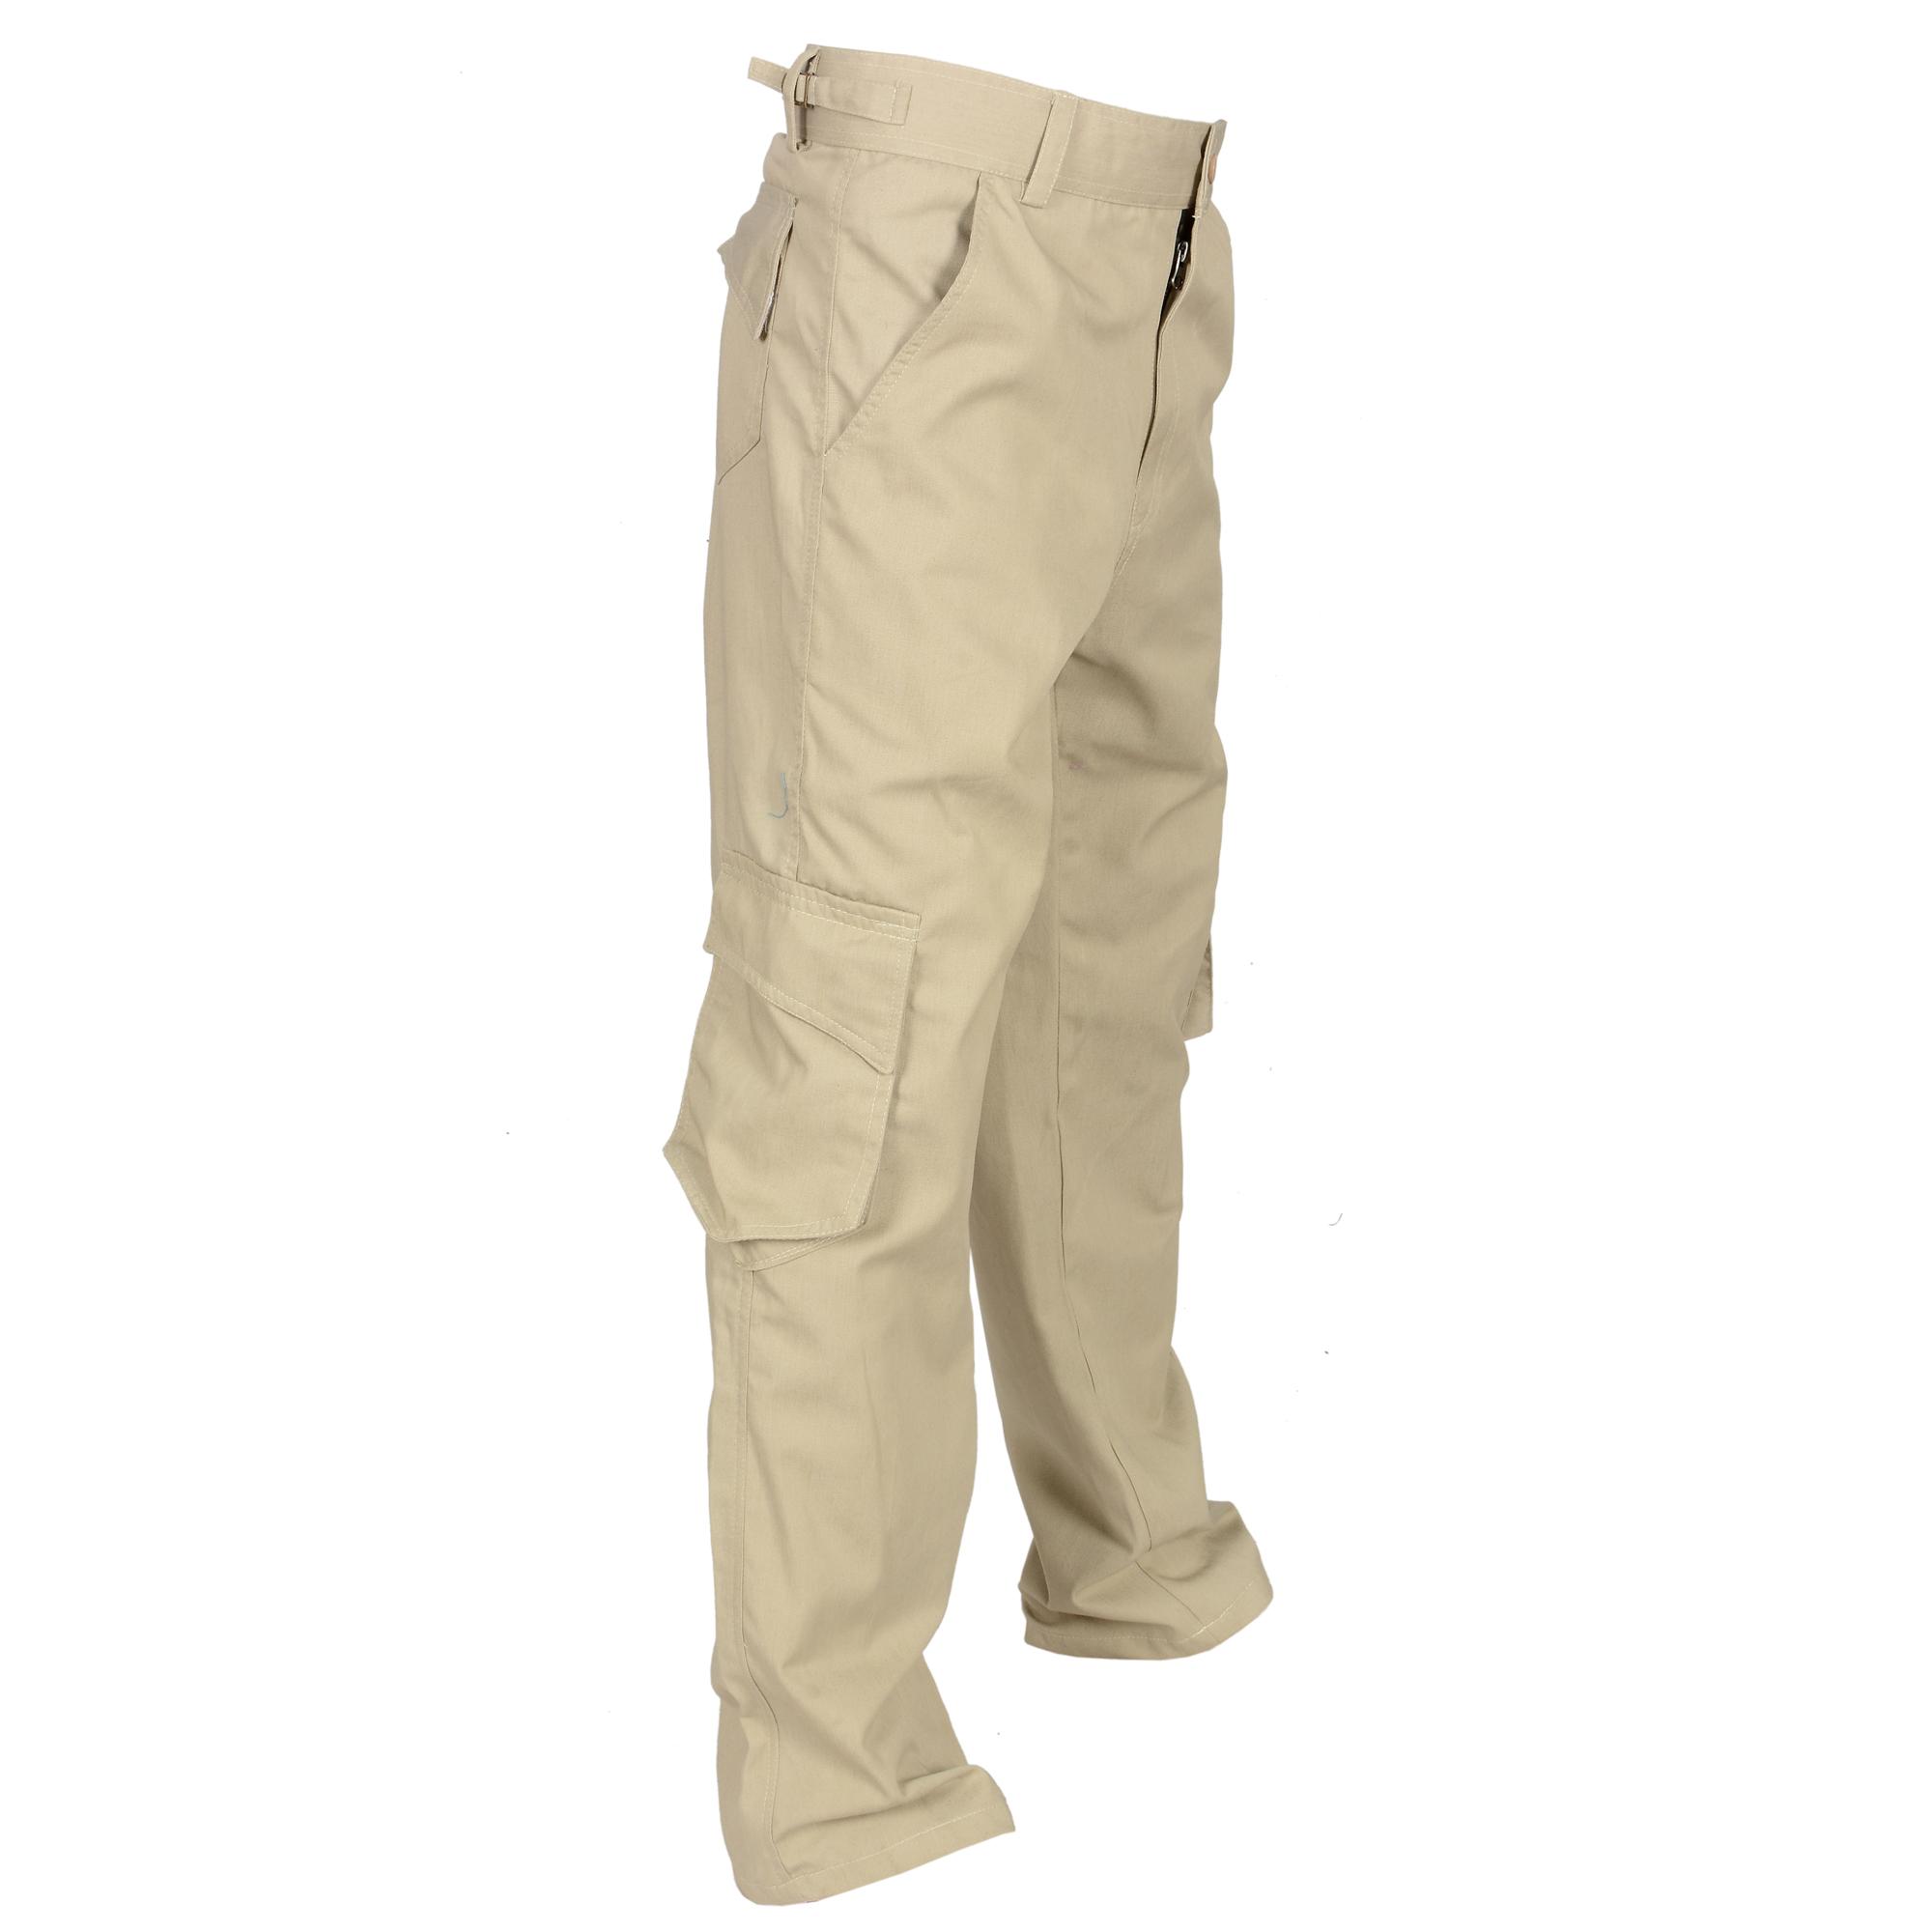 Men'S Pro Cargo Pants Casual Cargo Trouser